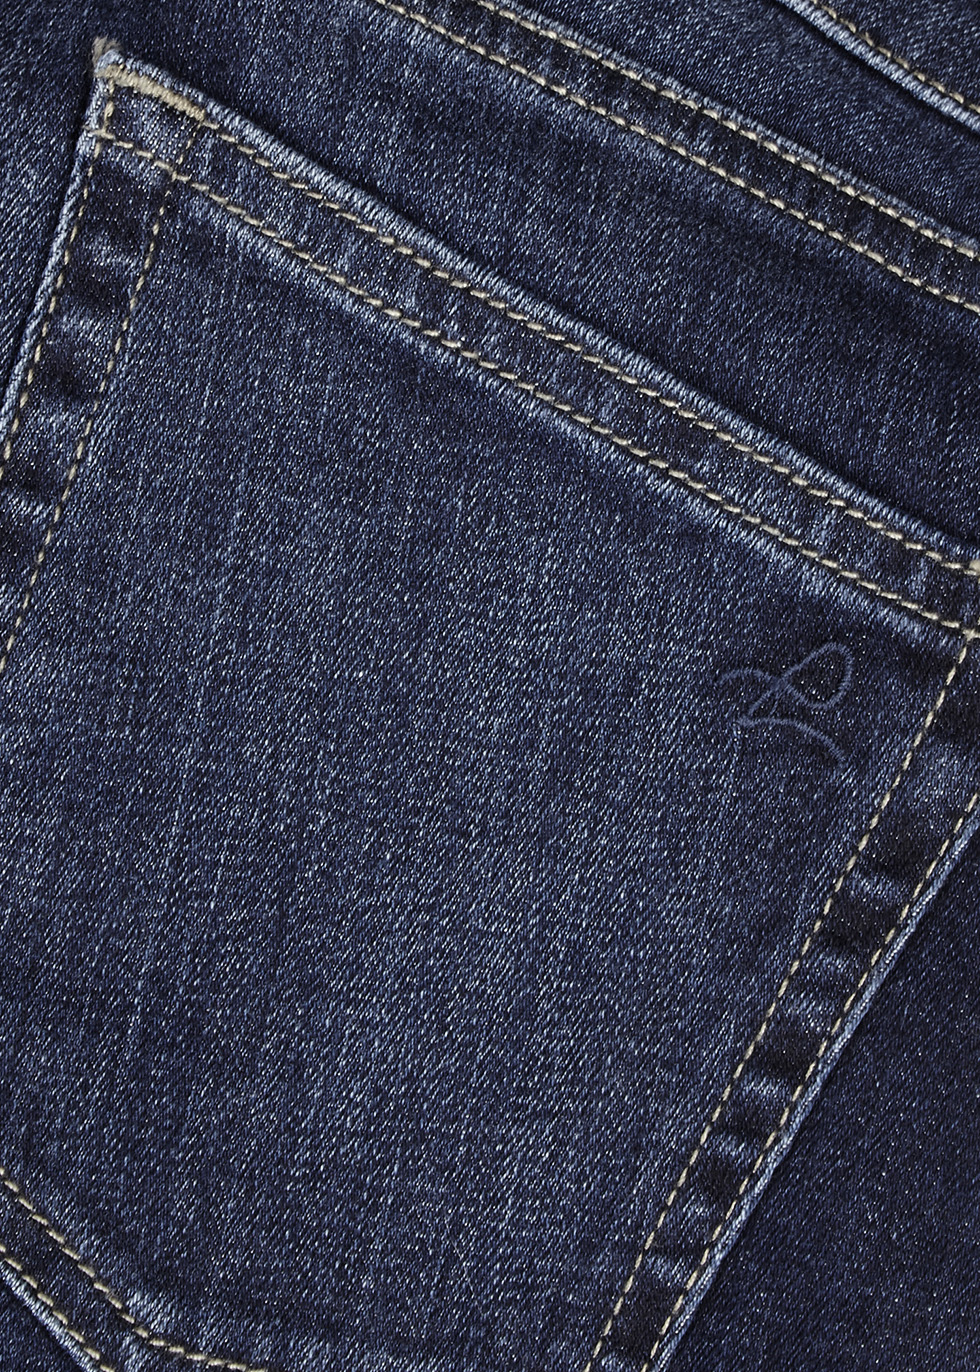 Margaux dark blue skinny jeans - DL1961